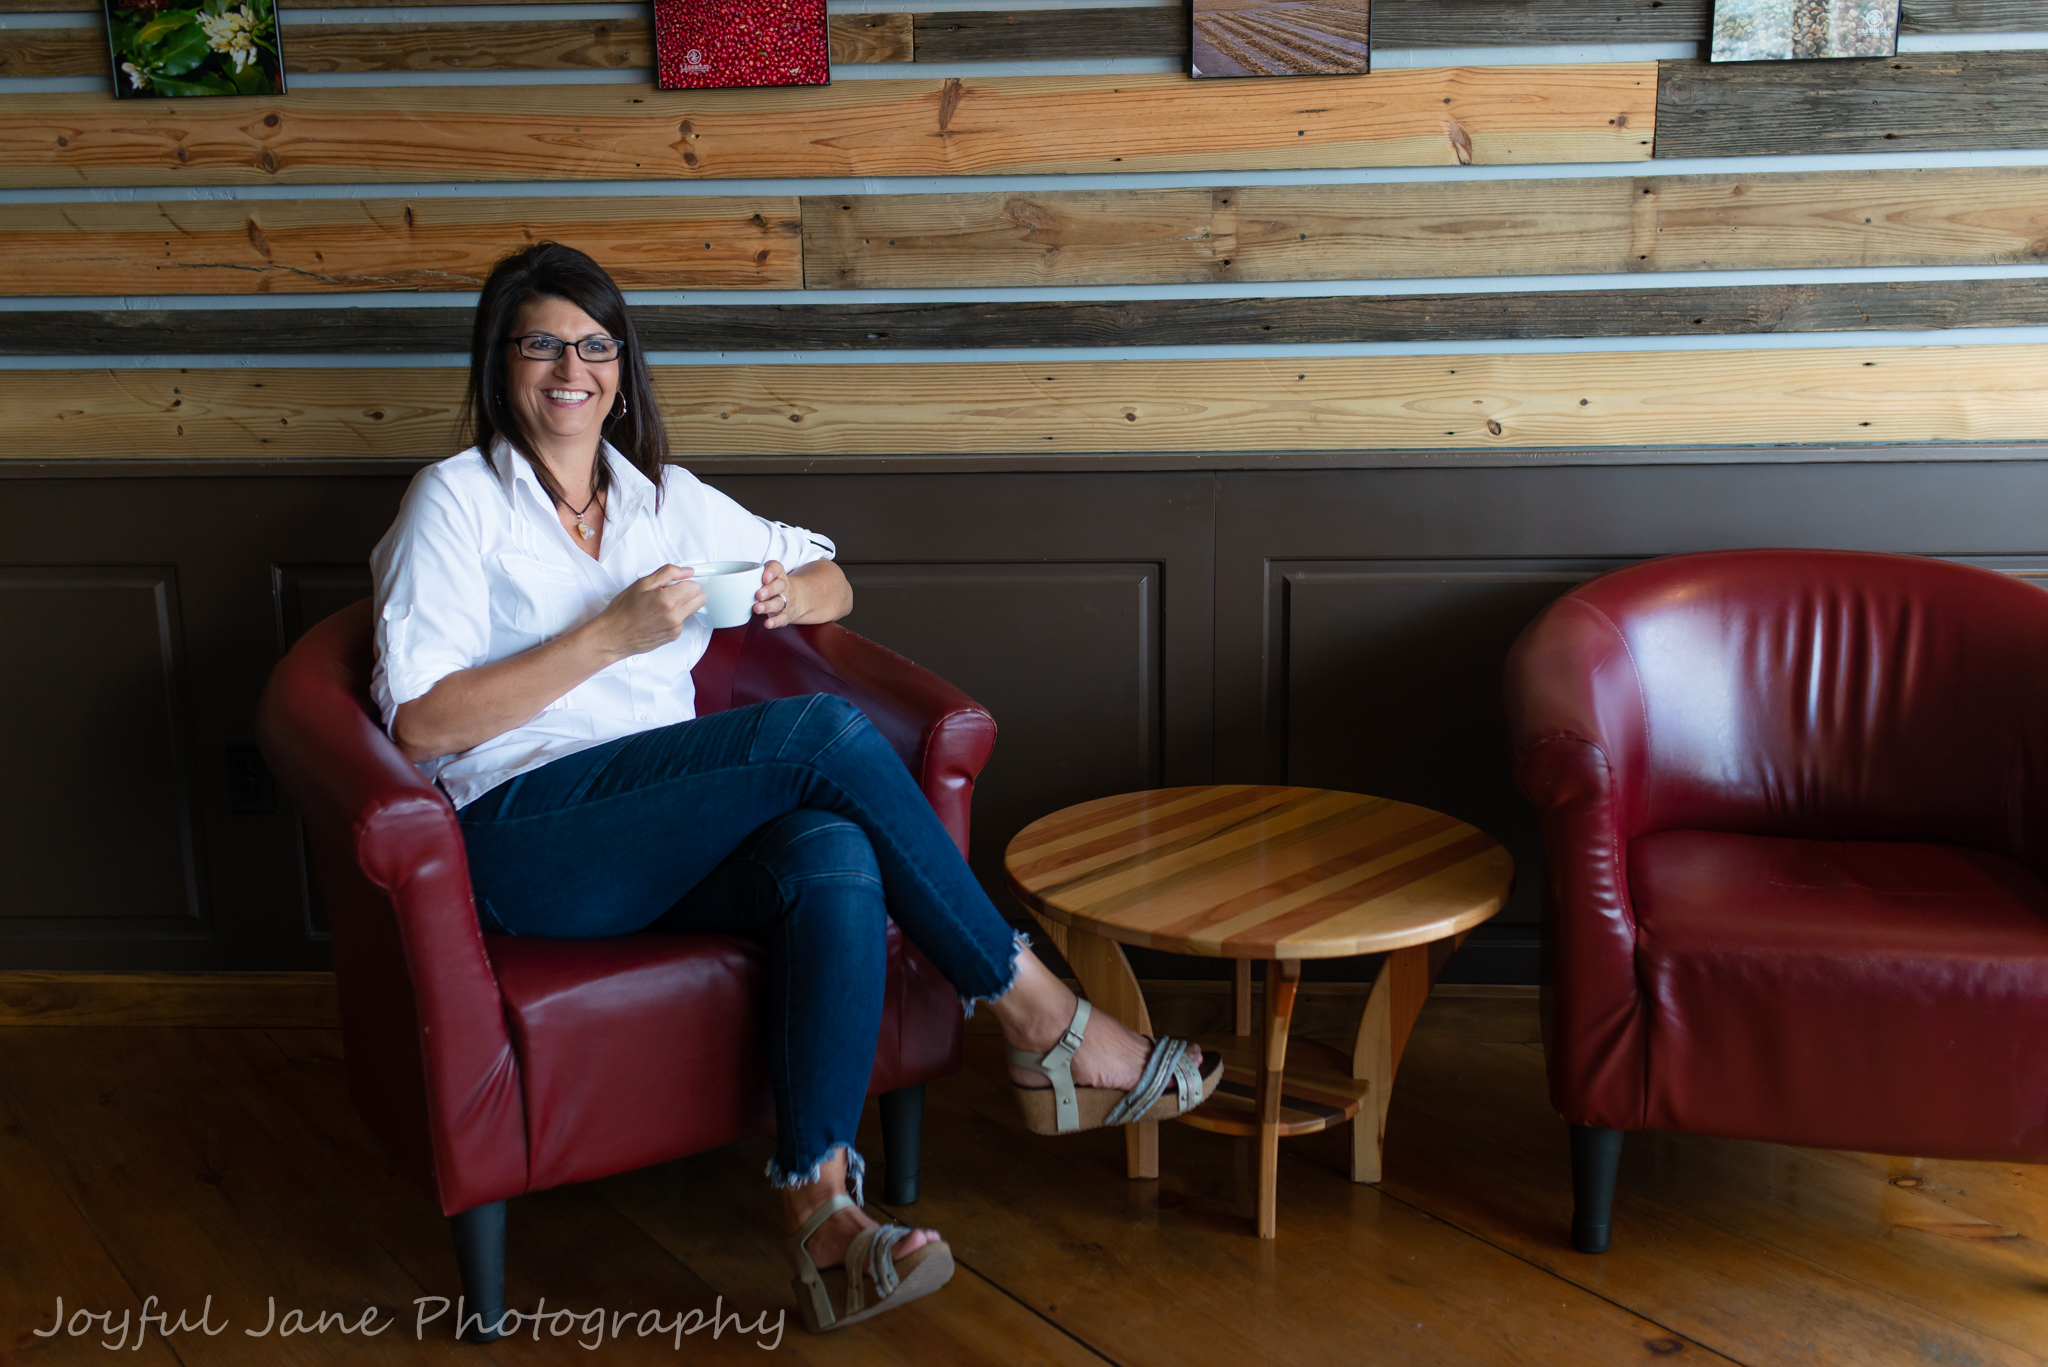 Joyful Jane Photography | Louisiana Business Photographer